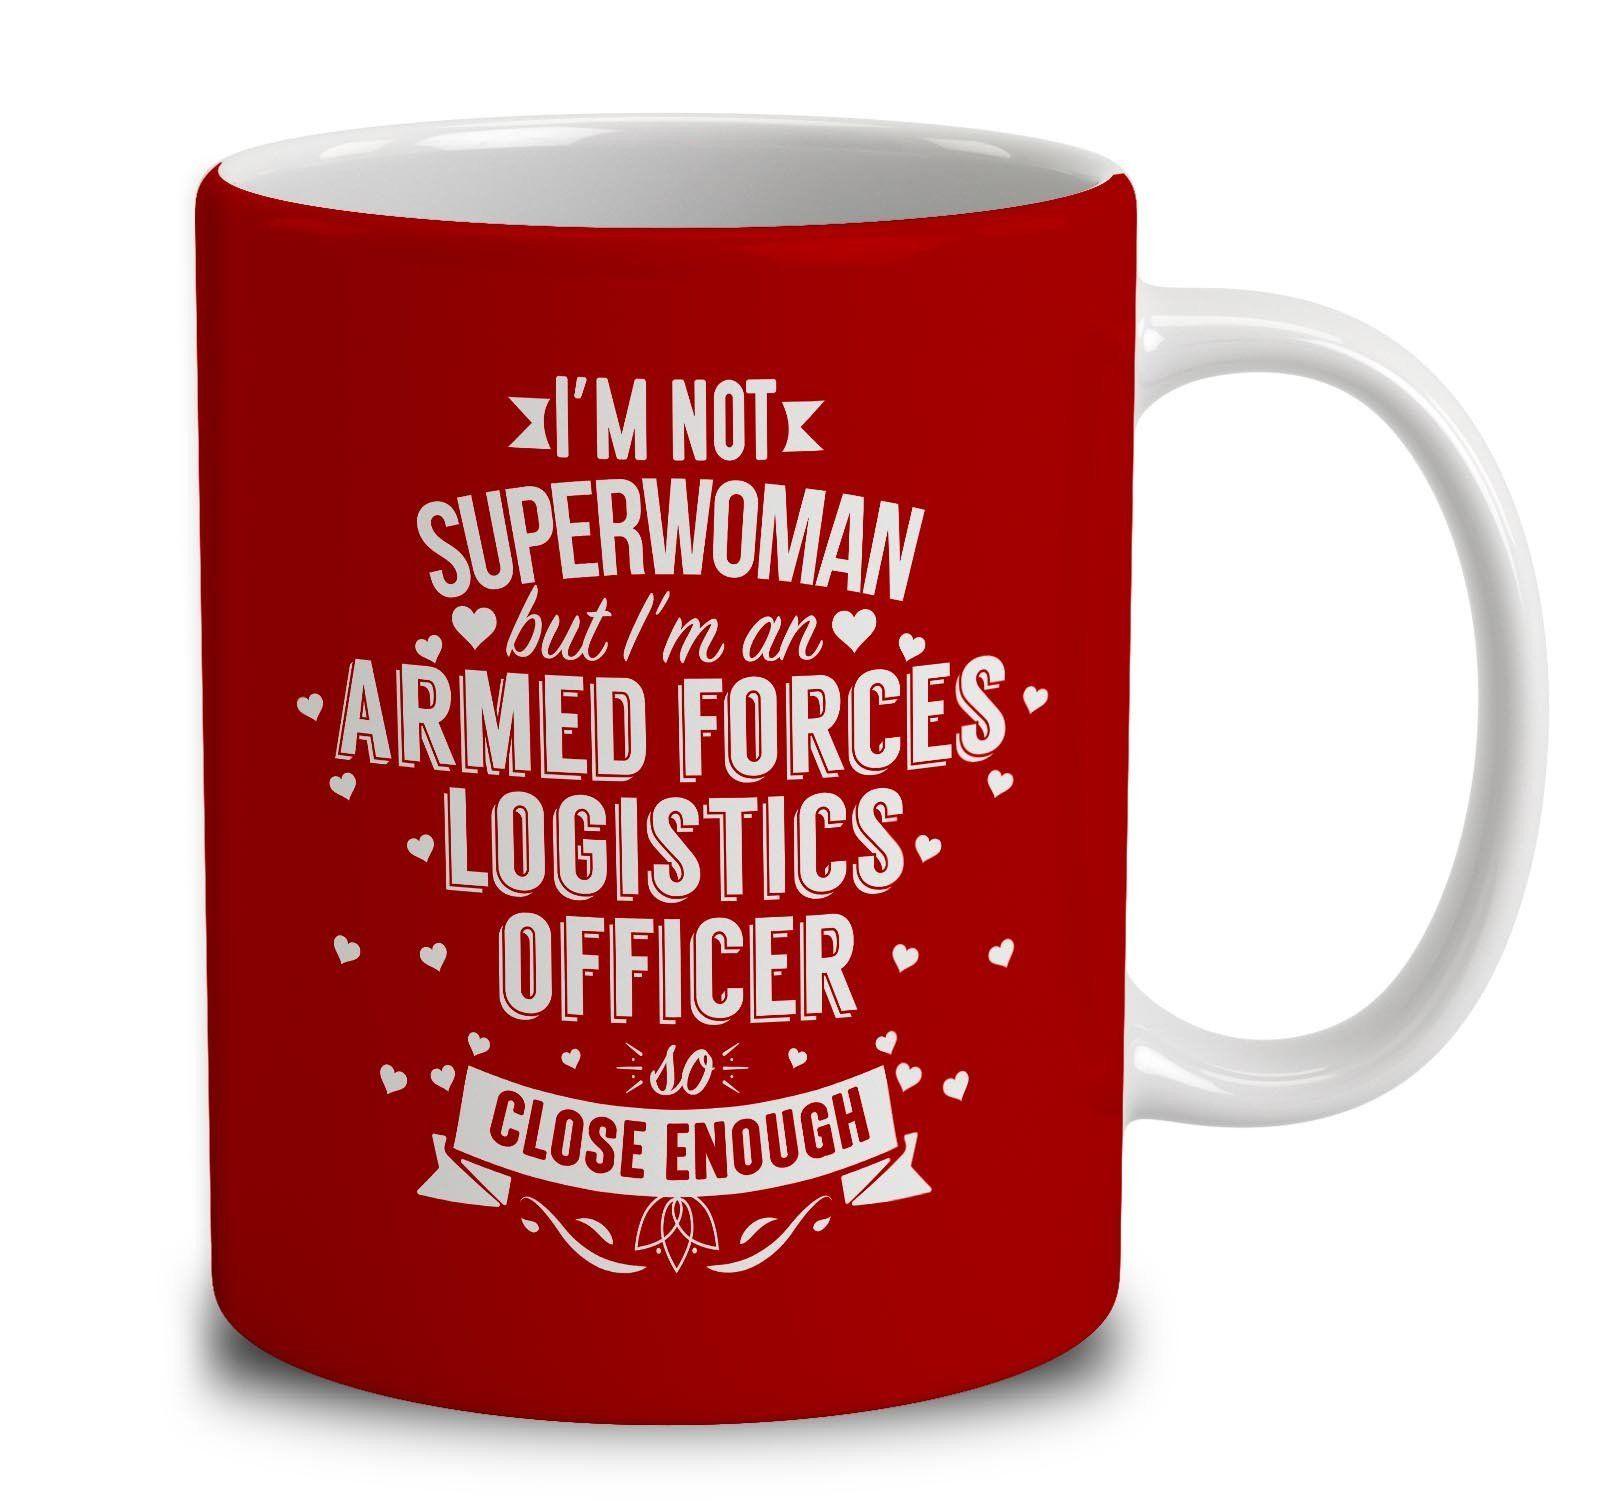 IM Not Superwoman But IM An Armed Forces Logistics Officer